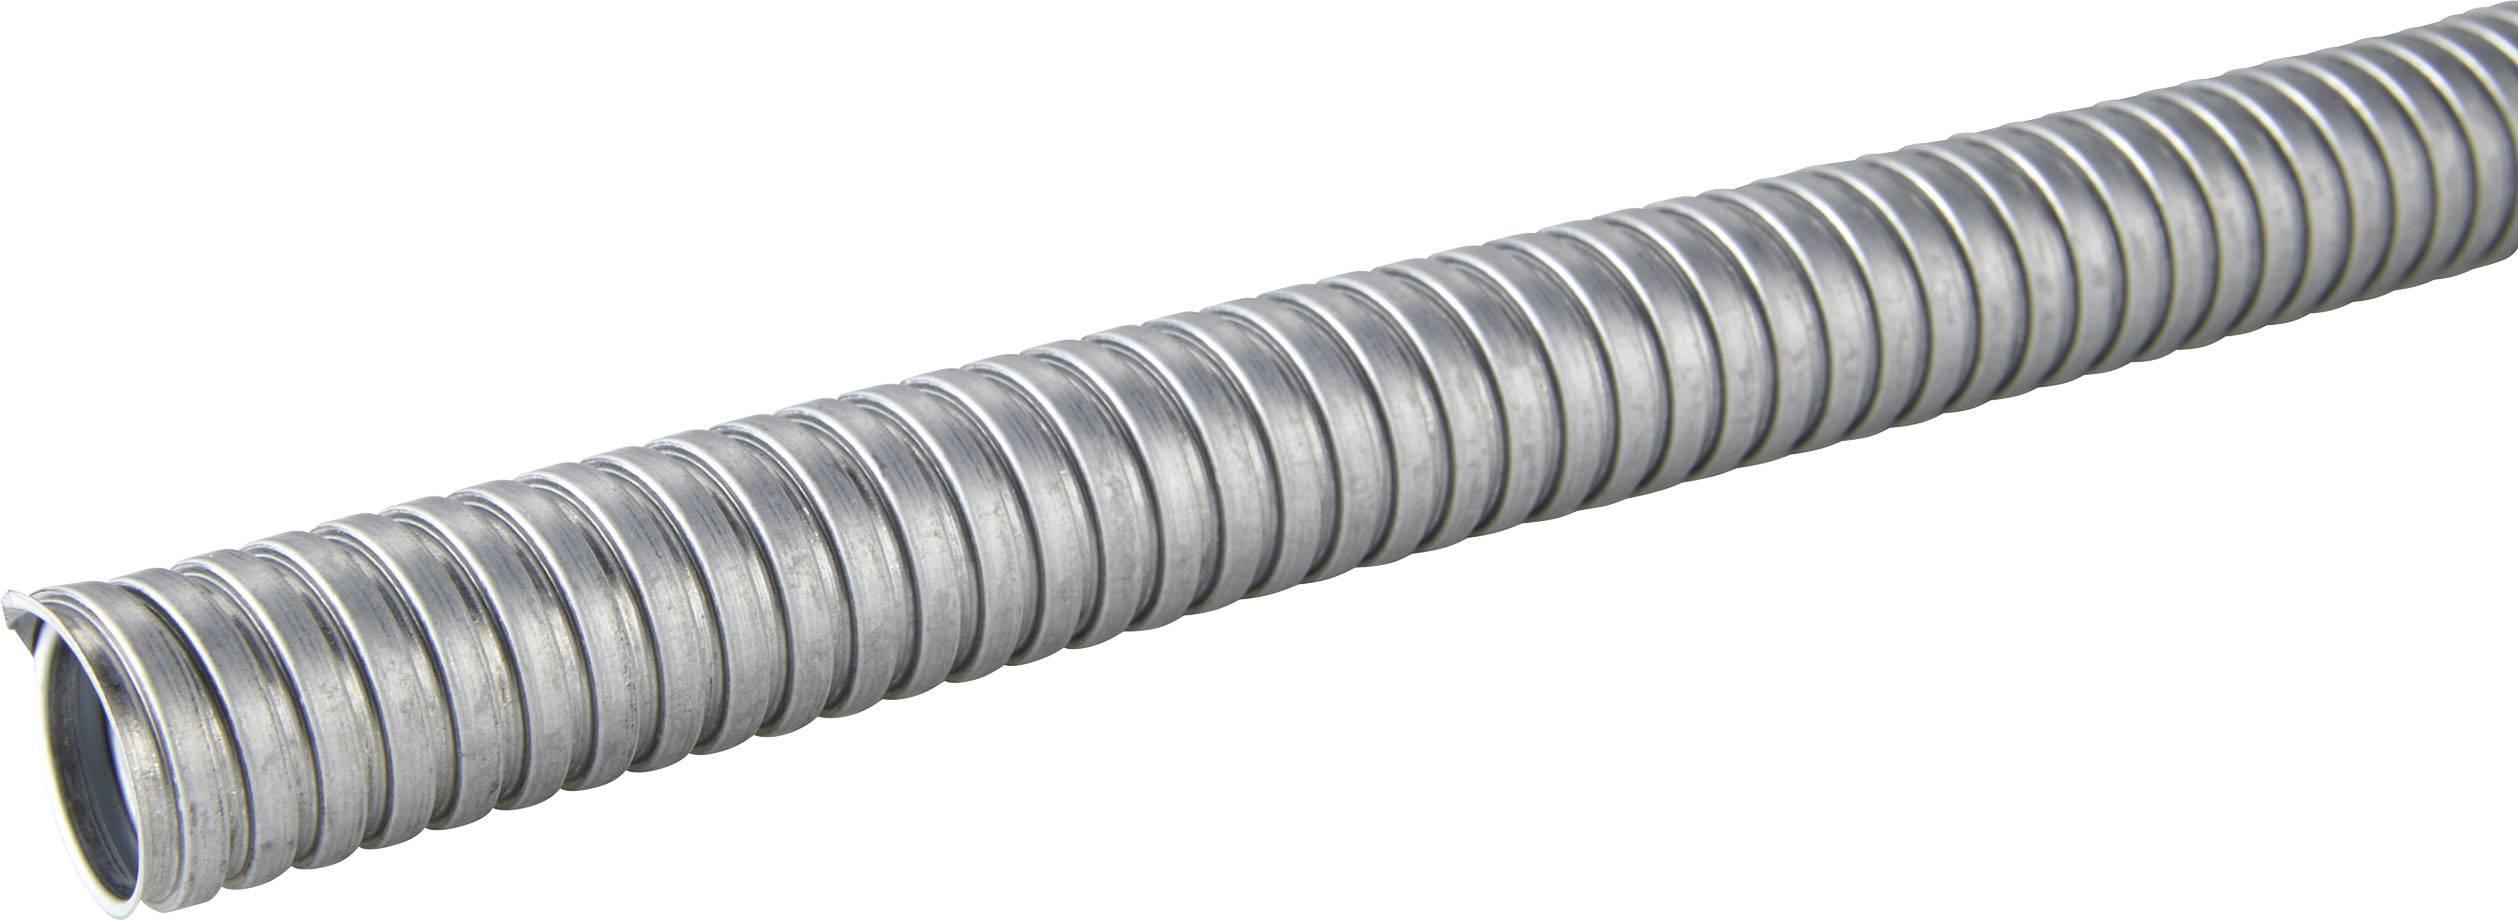 Ochranná hadice na kov LAPP SILVYN® AS 36/40x45 61802150, stříbrná, 25 m